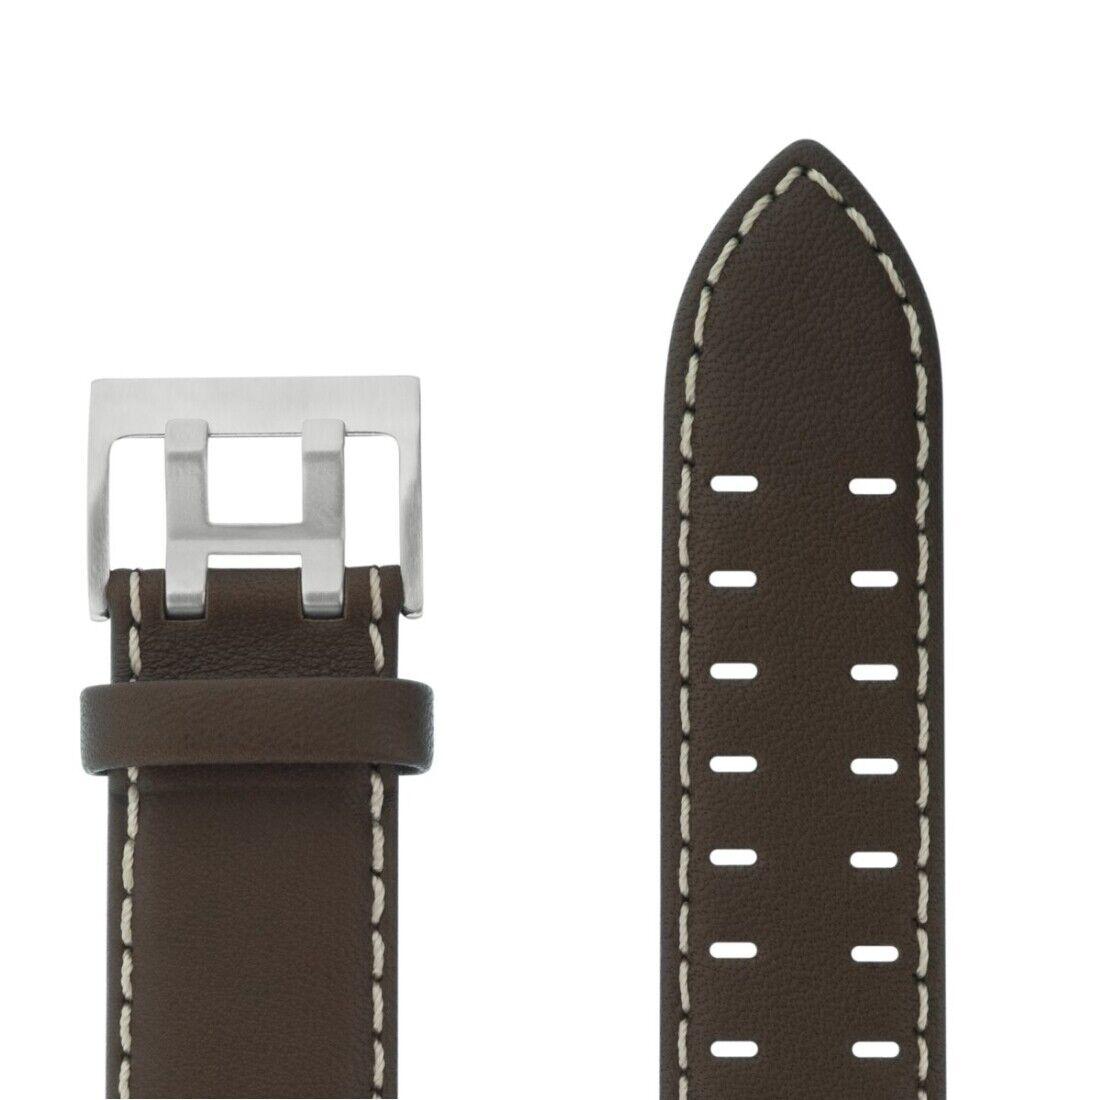 Uhrenarmband Armband  Leder 20 mm Breit braun mit heller Naht von Junkers